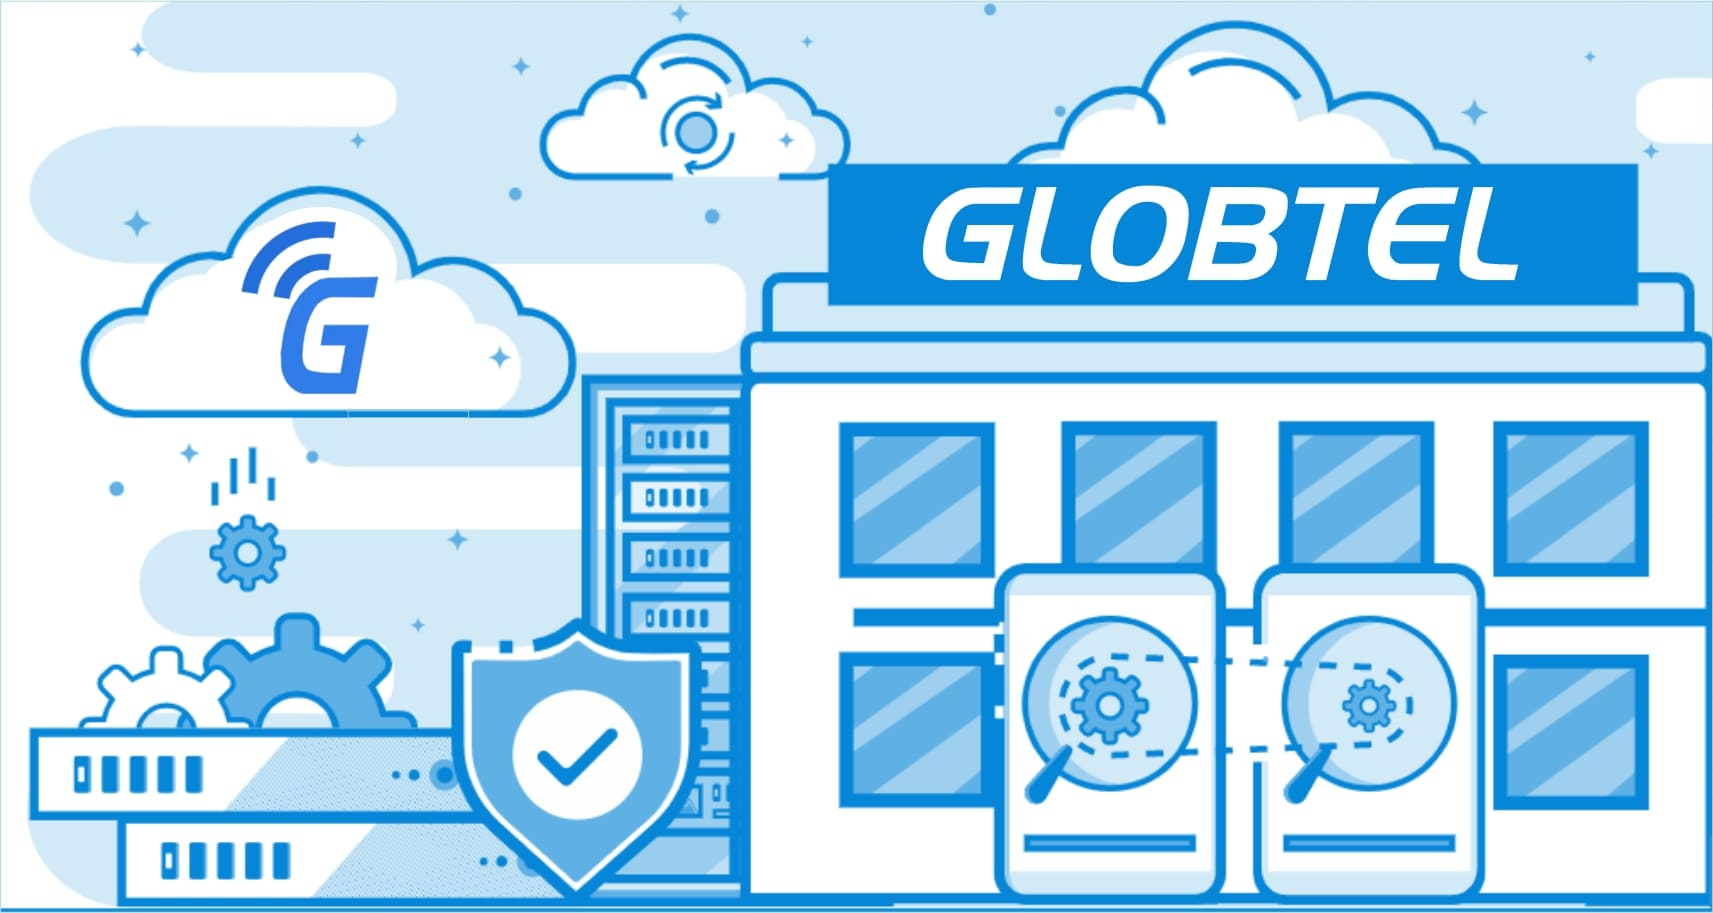 Server systems and Data Center soft